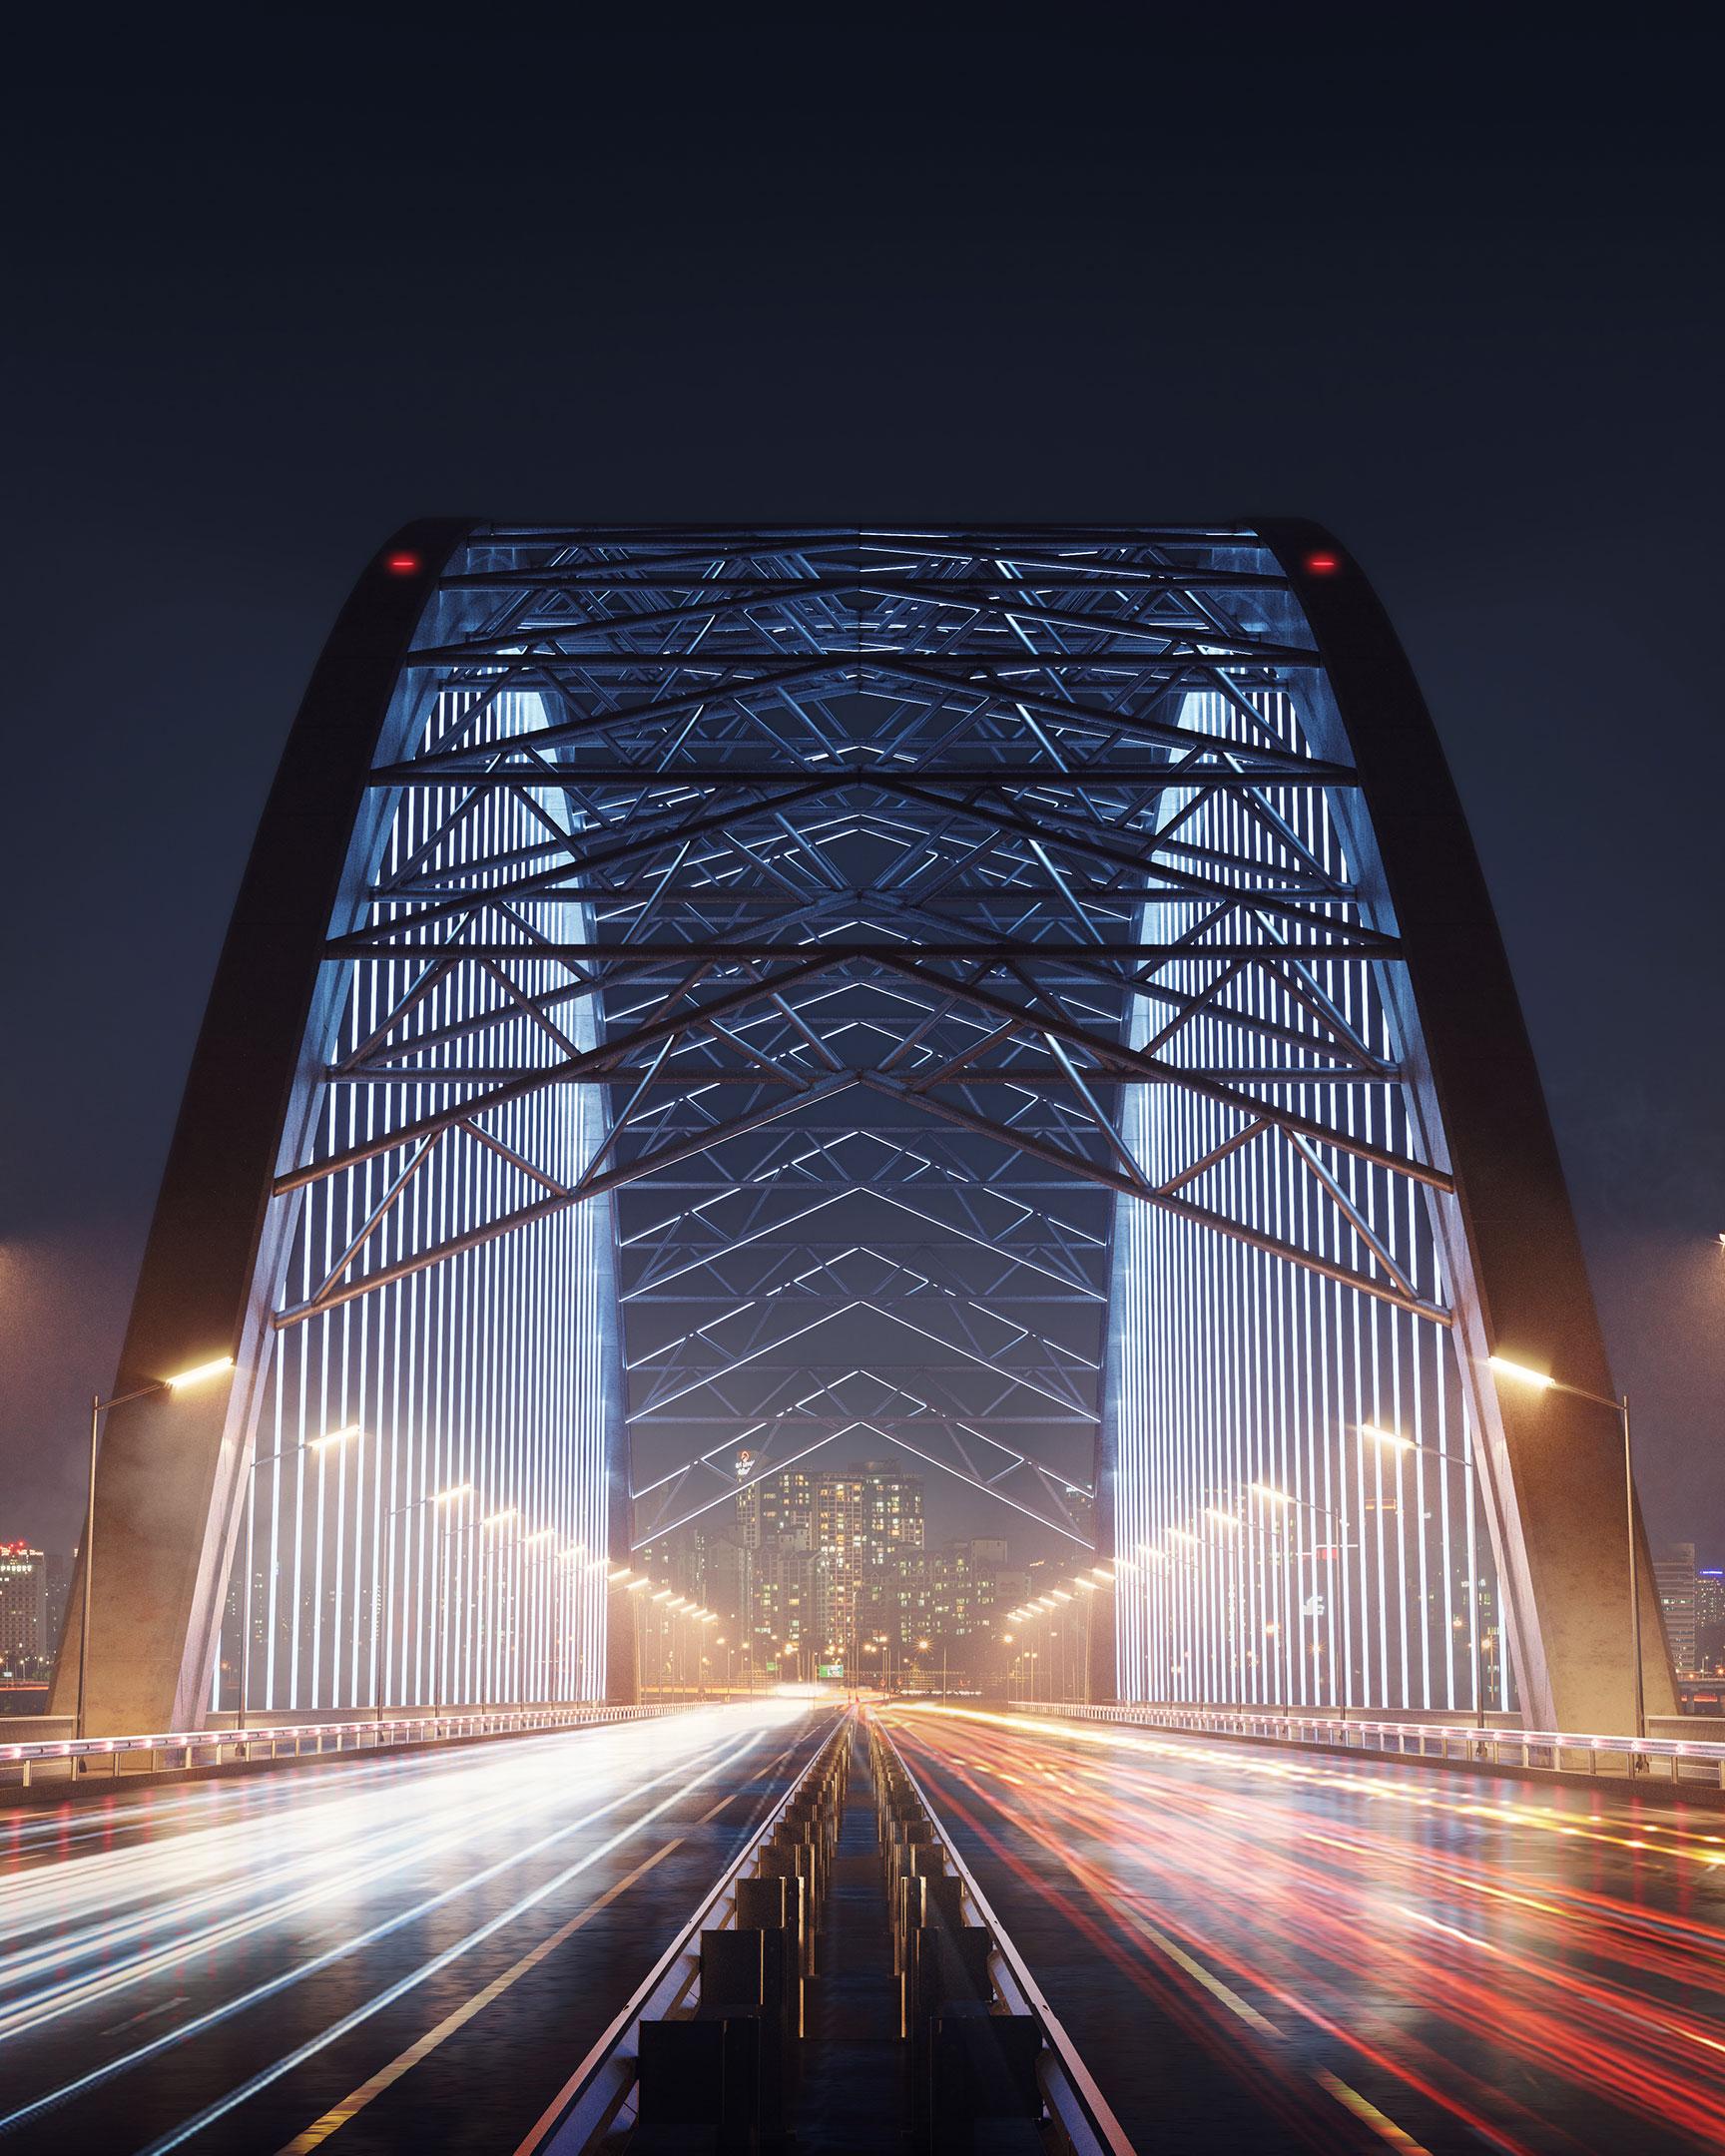 3D Rendering for a Ukrainian Bridge Under Construction